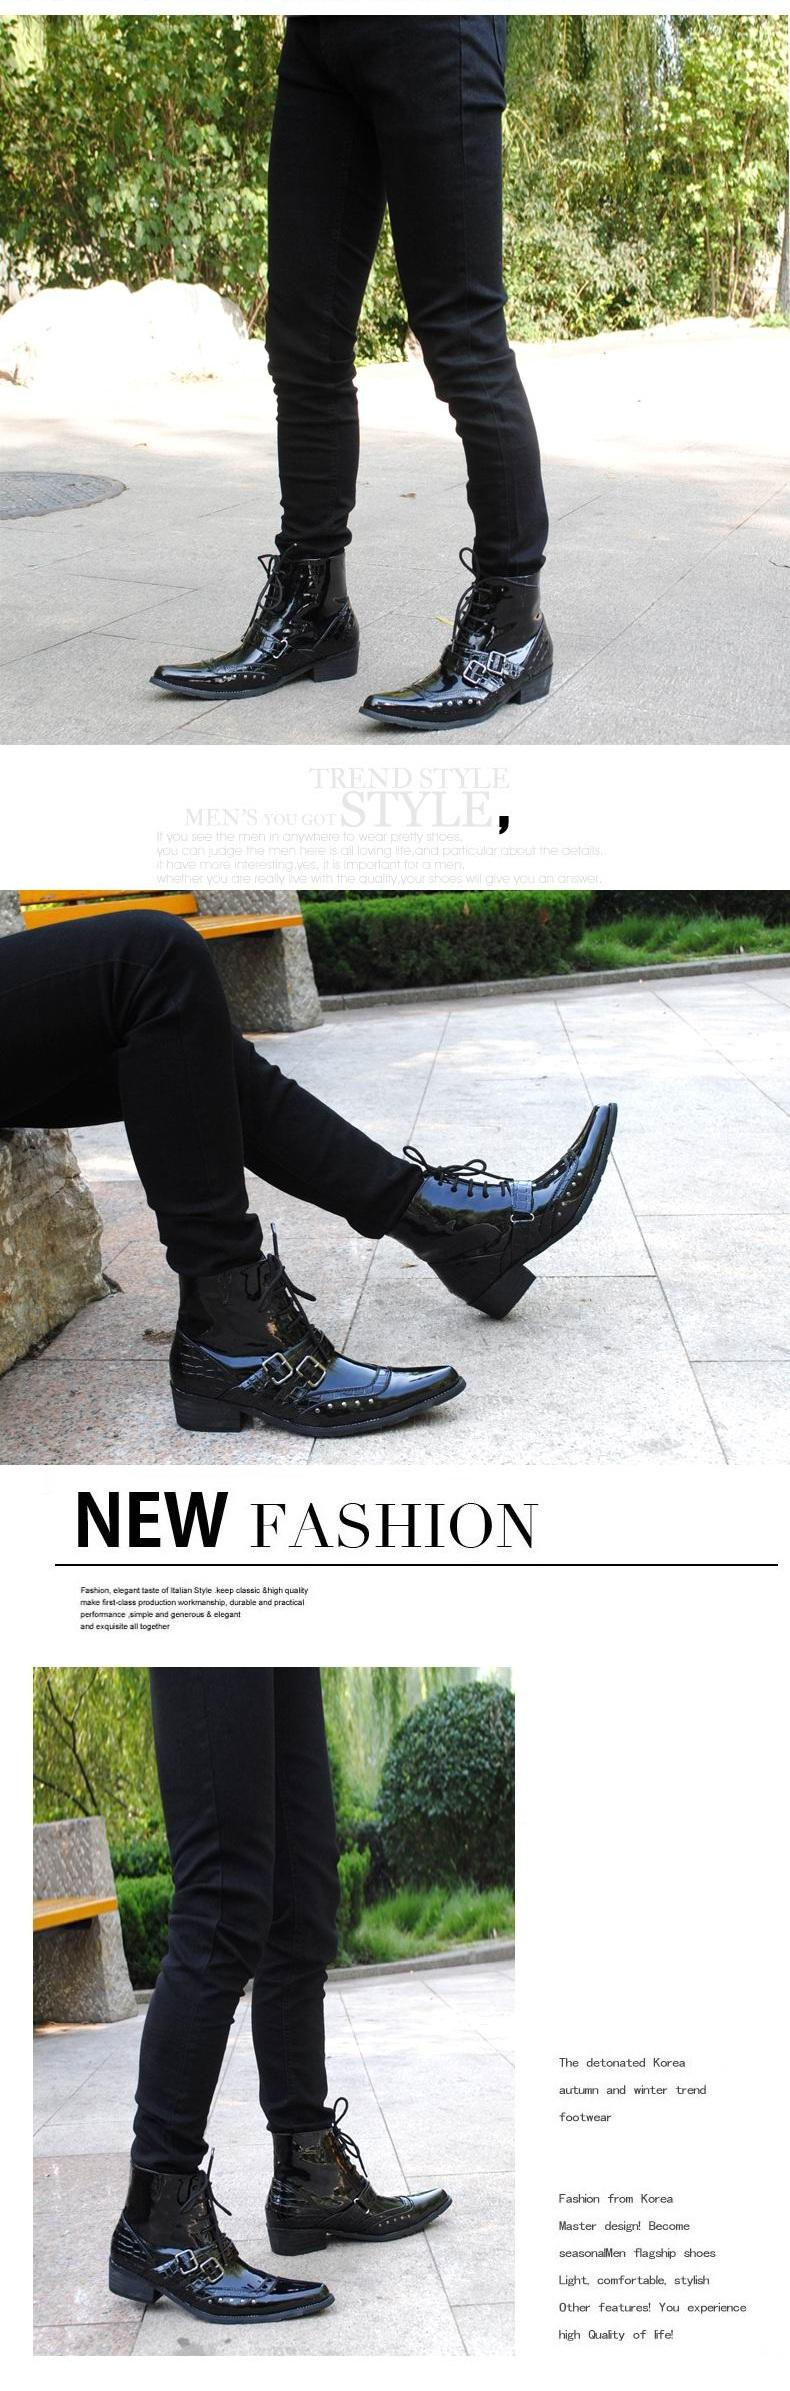 Compre Corea Diseñador Moda Hombres Botas Negro Punta Estrecha Hebilla Botín Para Hombres Bota De La Motocicleta Zapatos De Charol Espinas Remaches